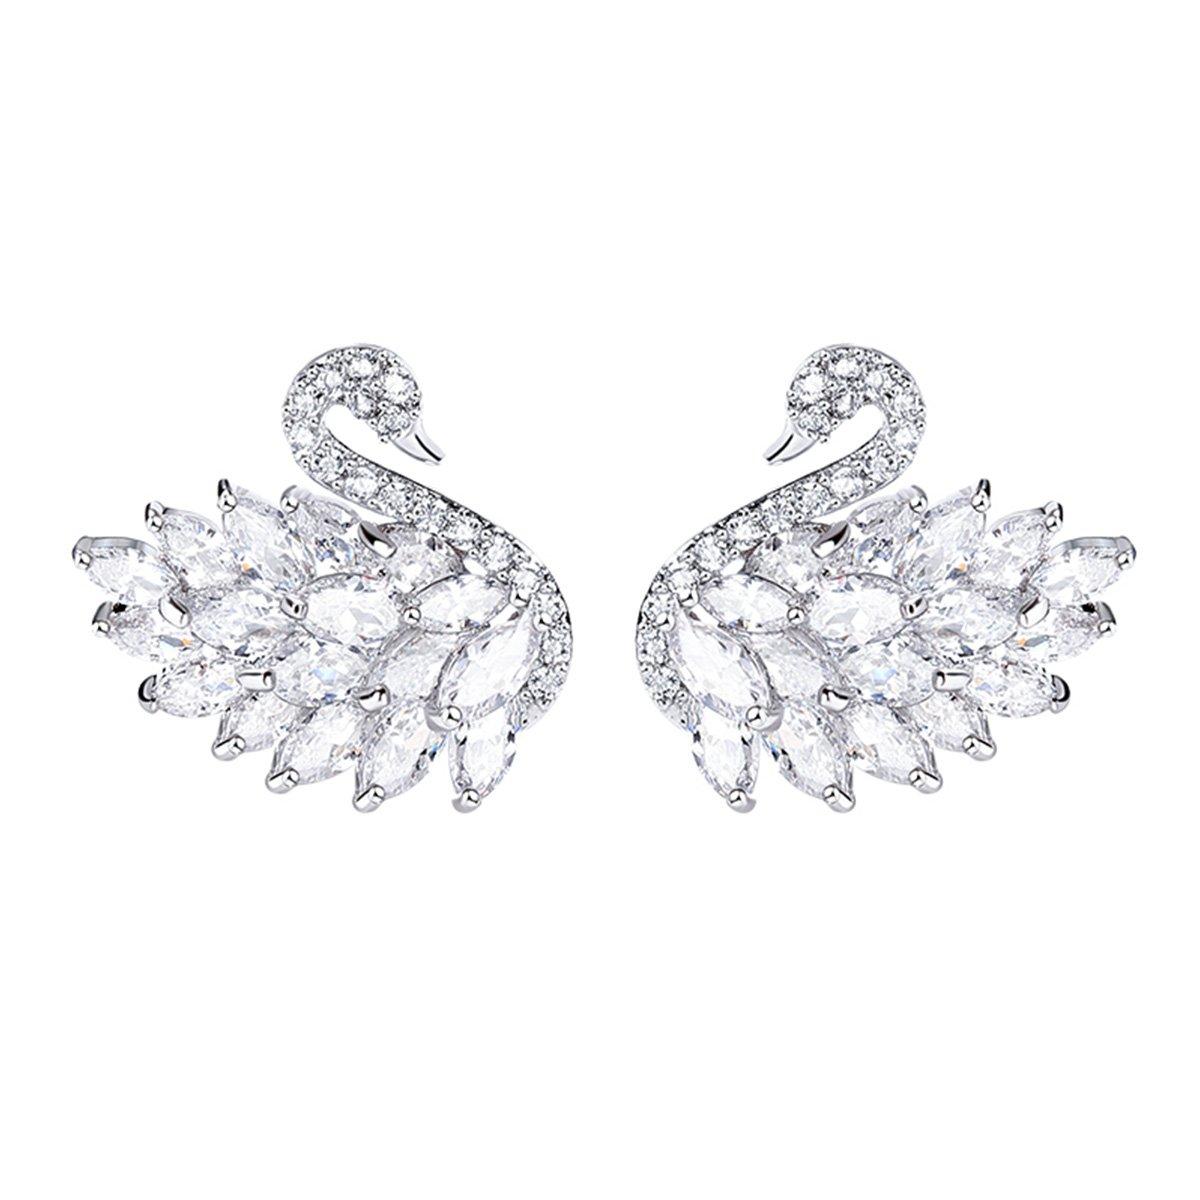 Merdia Lovely Swan Stud Earrings Cubic Zirconia Sterling Silver Pin for Women and Girls-White Swan